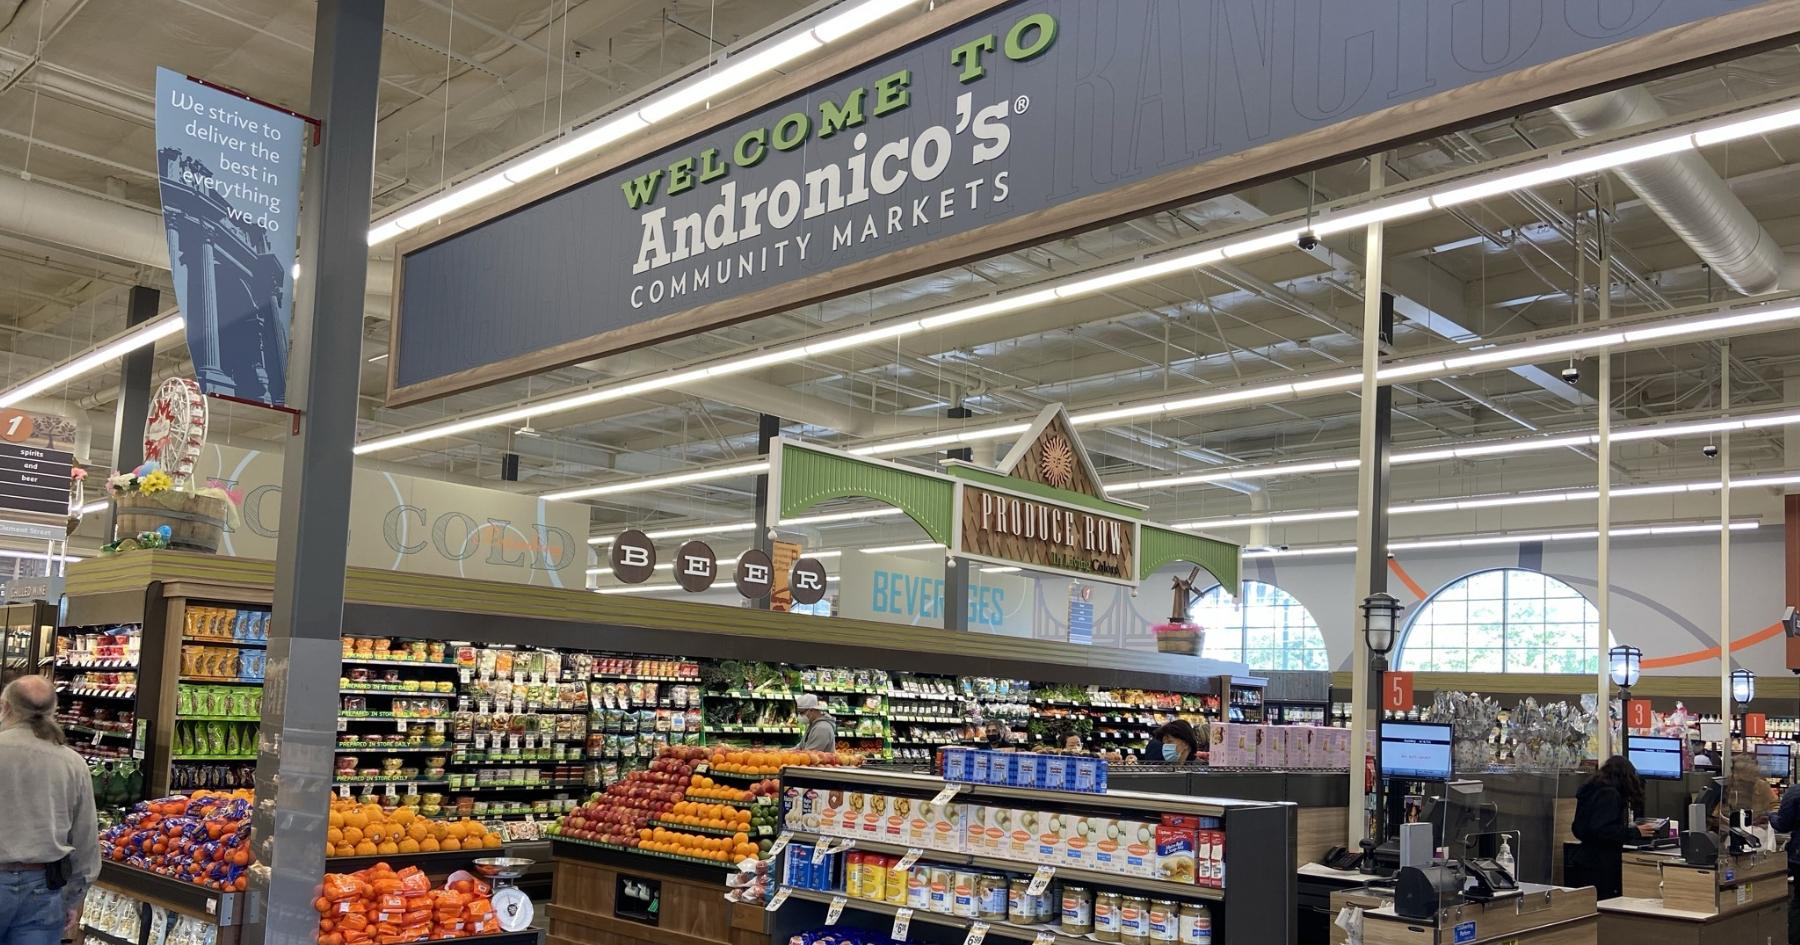 Andronico's Community Markets